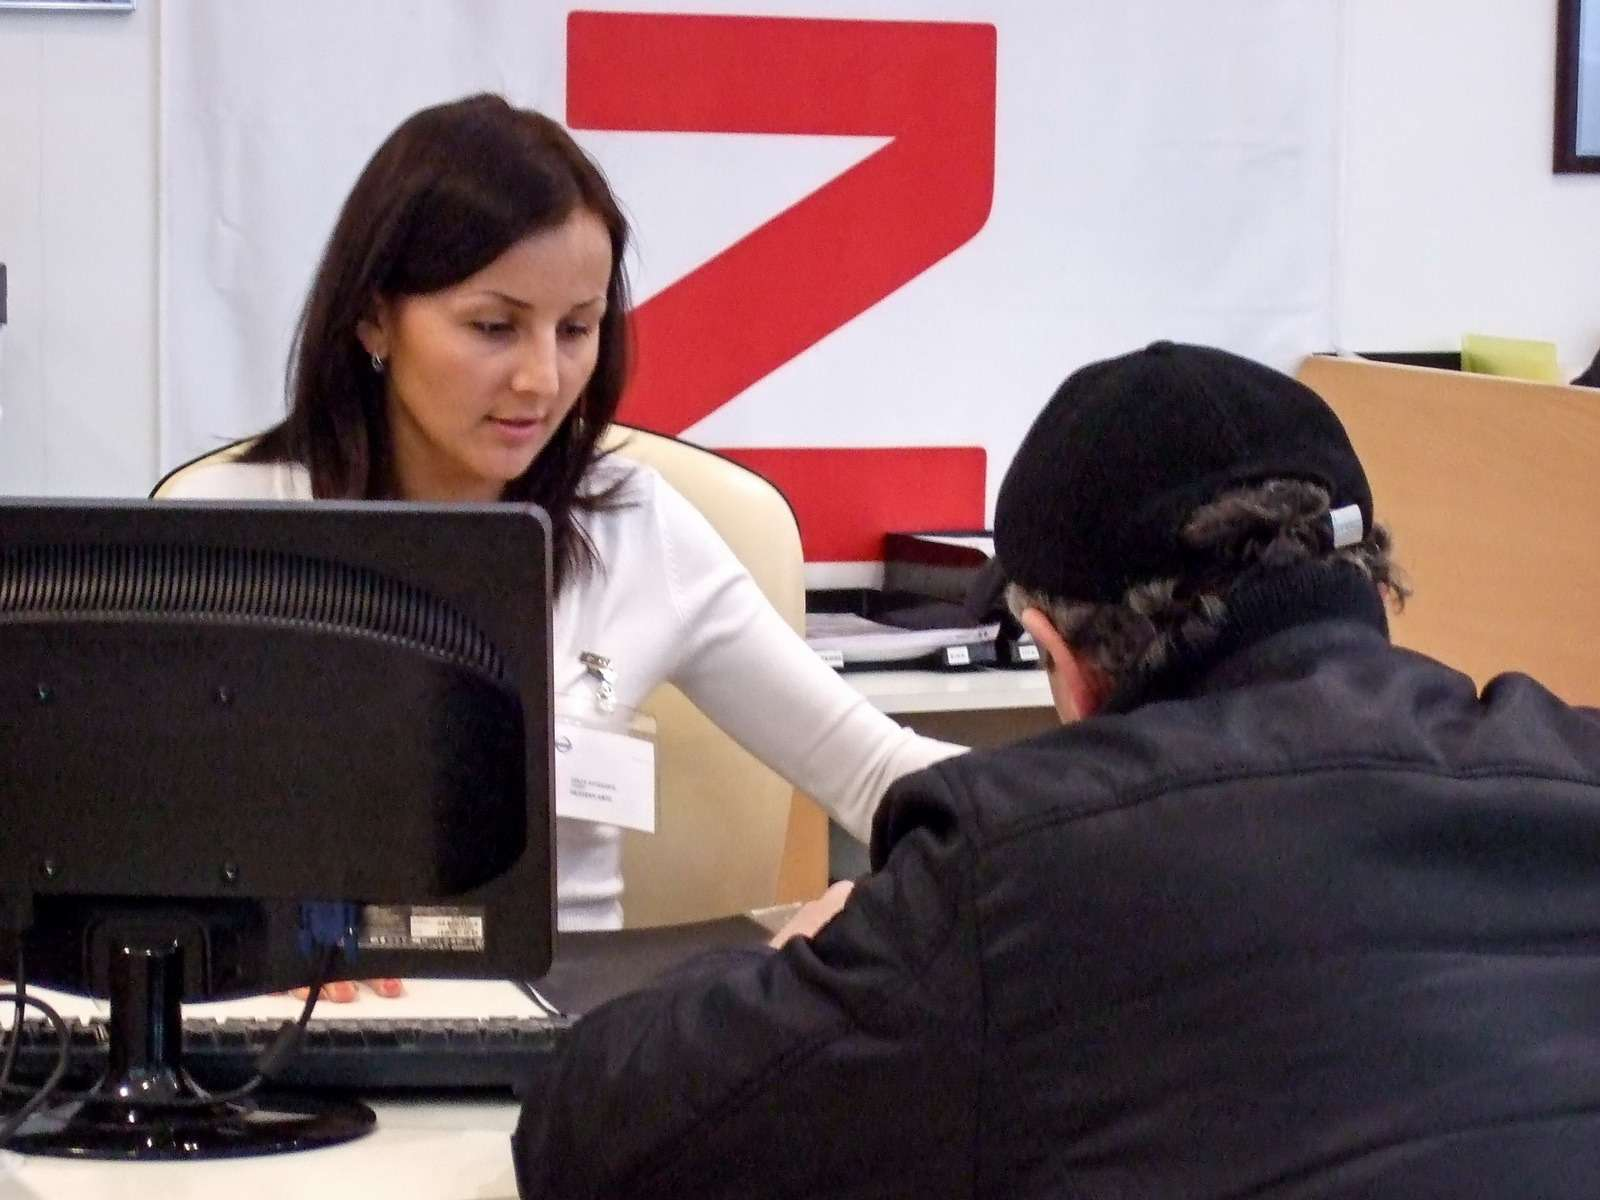 24kupi auto_zr 04-13_новый размер